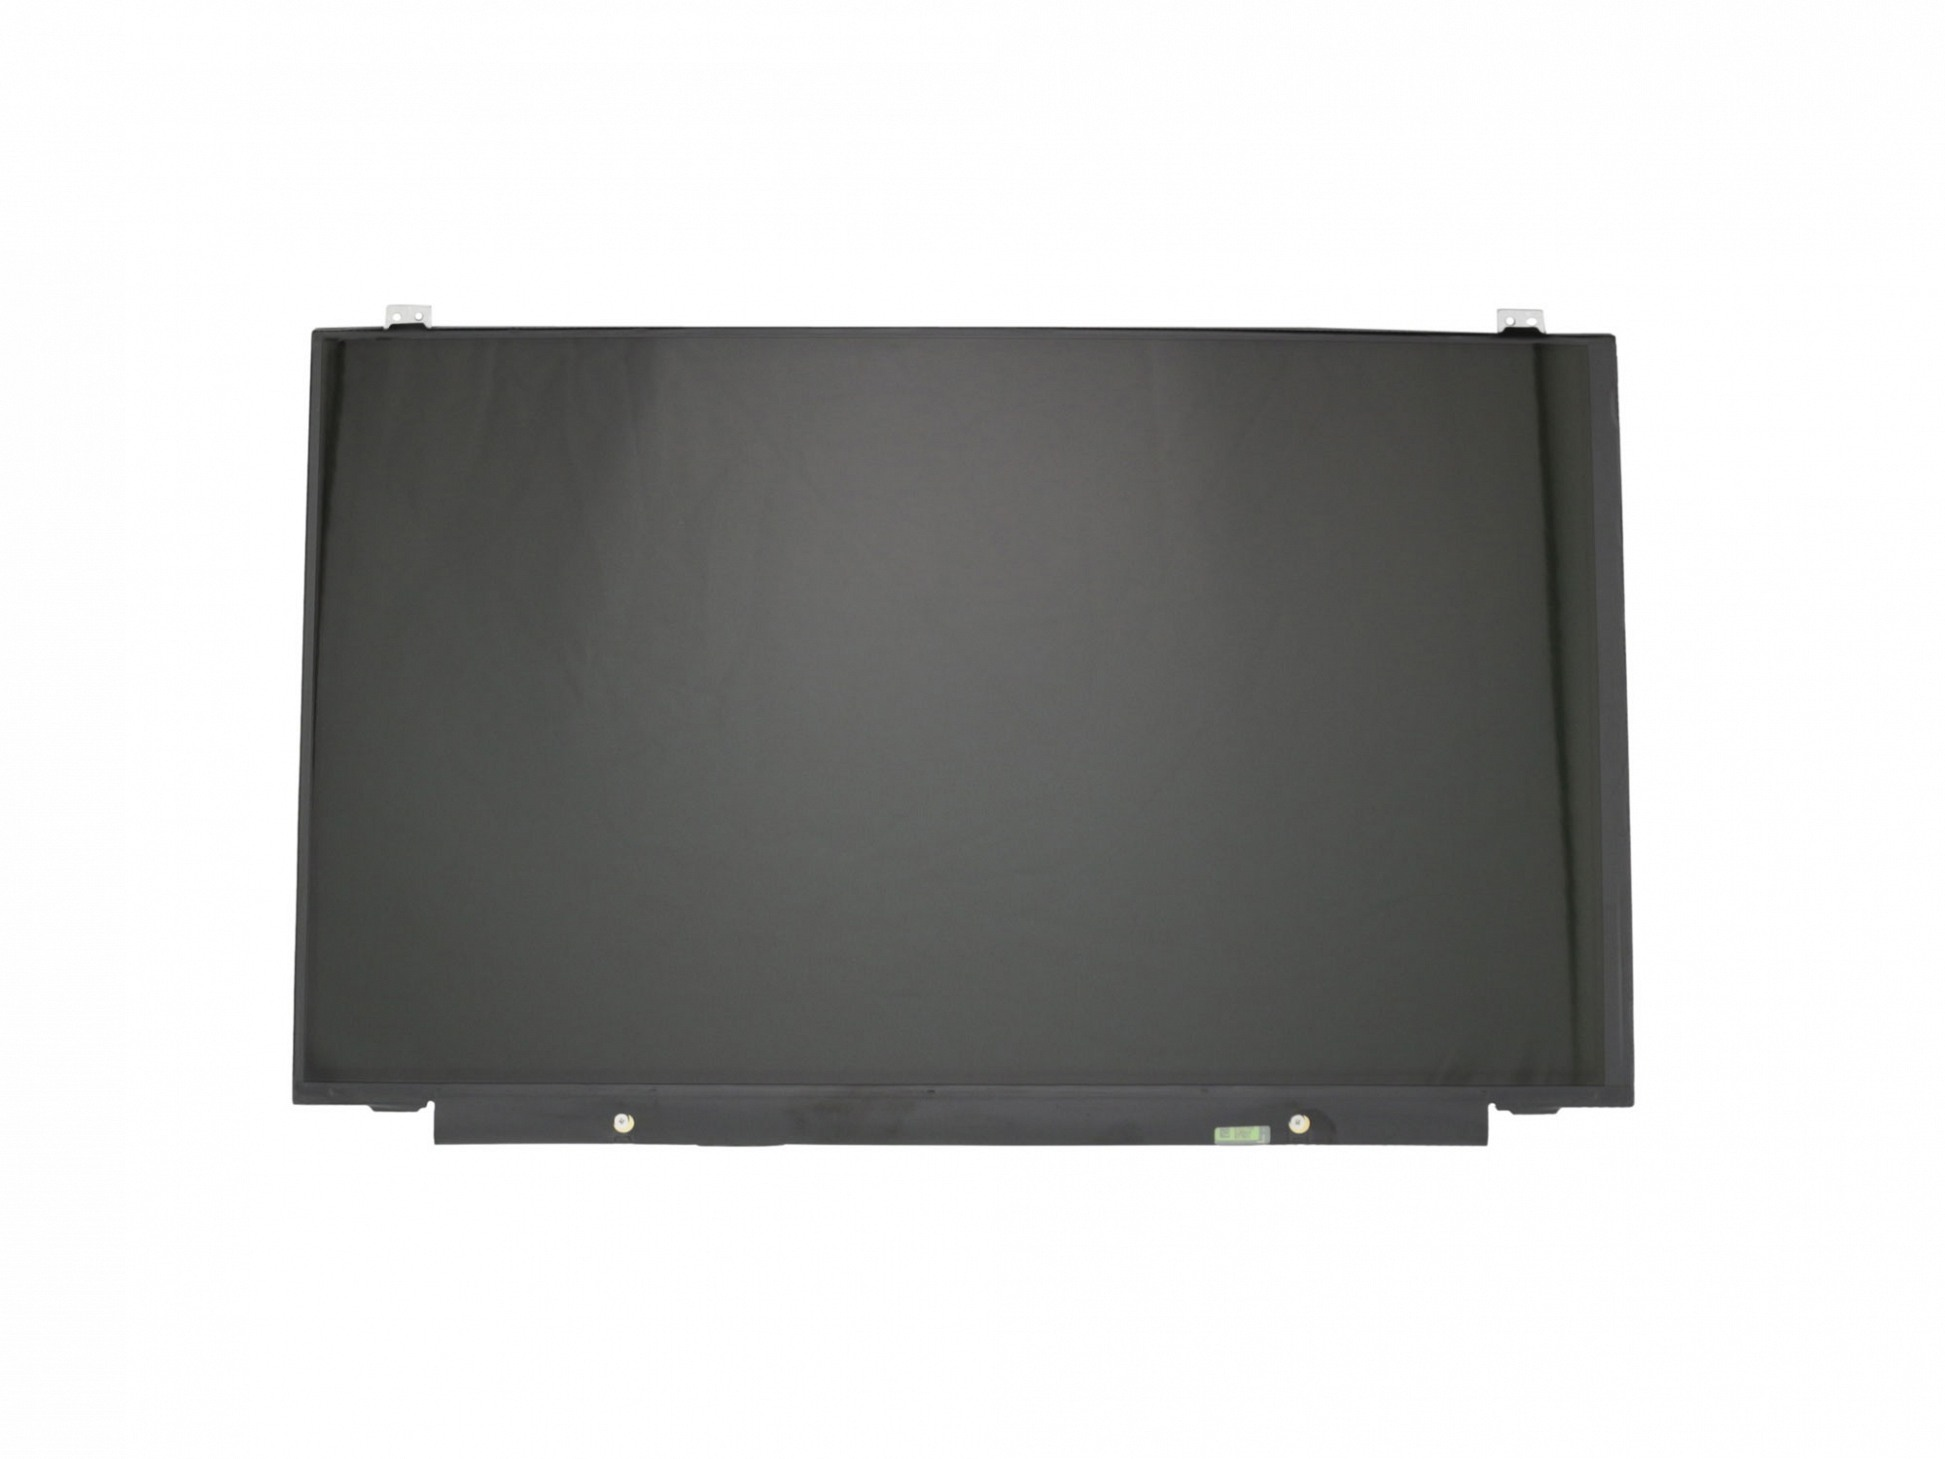 Display 15,6 Zoll HD glare LED 798914-1D1 für Hewlett Packard ...